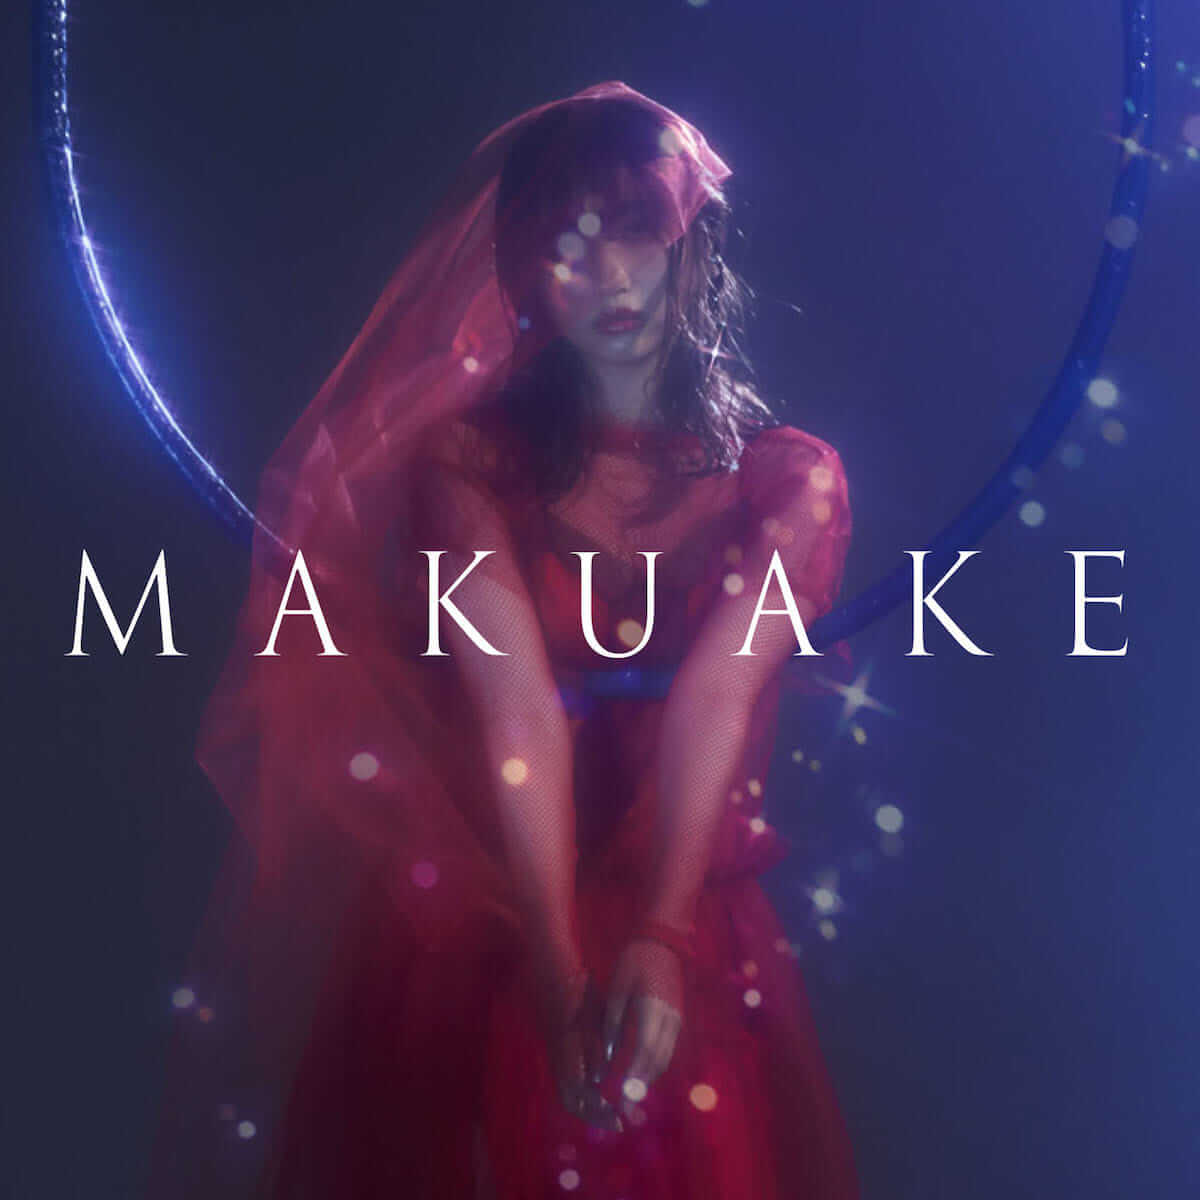 SKY-HIのアルバムへの楽曲参加などで話題のeill、デビューアルバム『MAKUAKE』を10月3日(水)にリリース!! music_MAKUAKE_180823_01-1200x1200